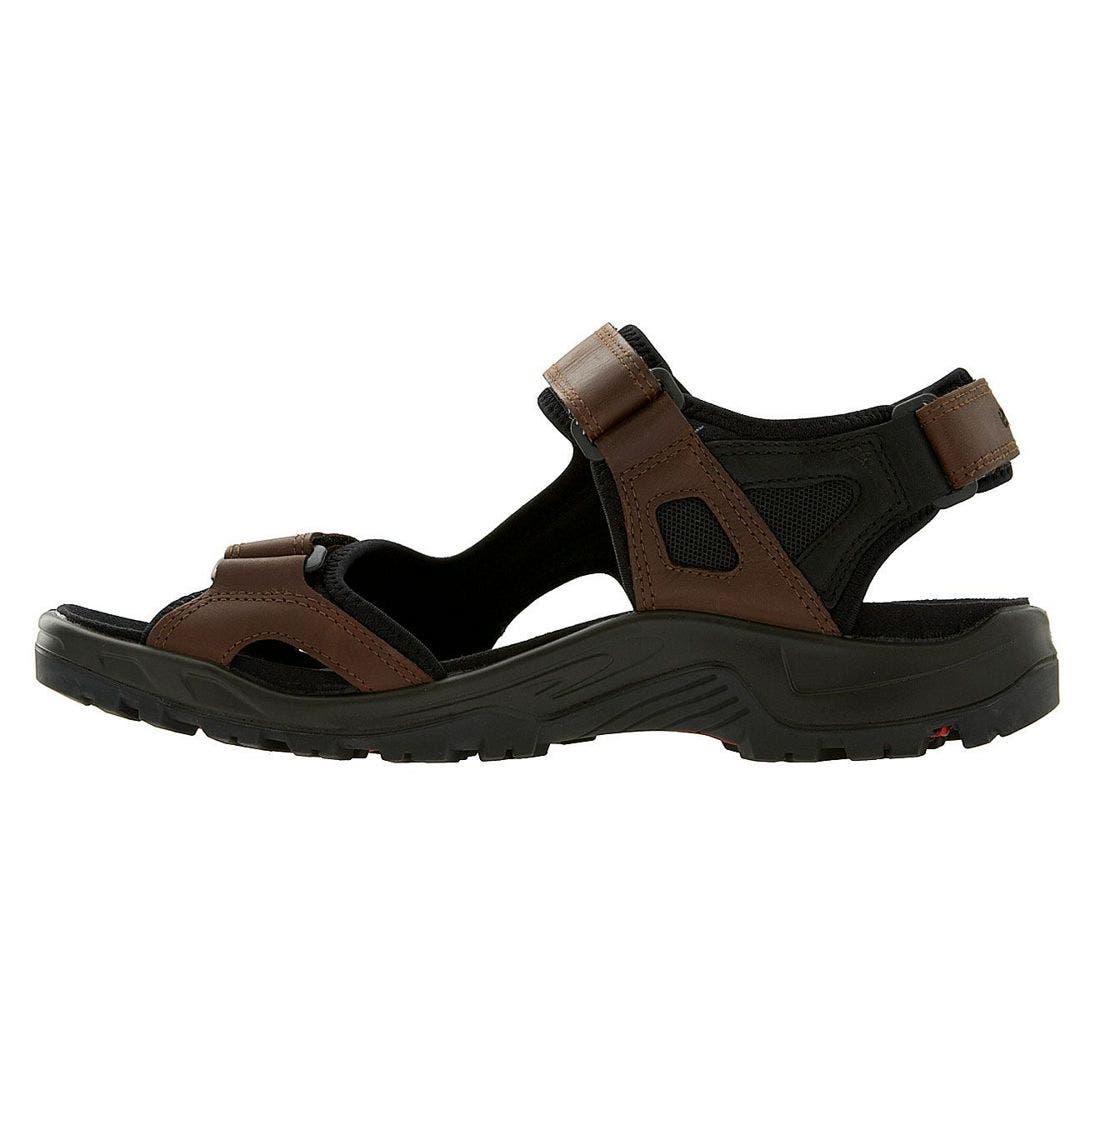 'Yucatan' Sandal,                             Alternate thumbnail 2, color,                             Brown/Black